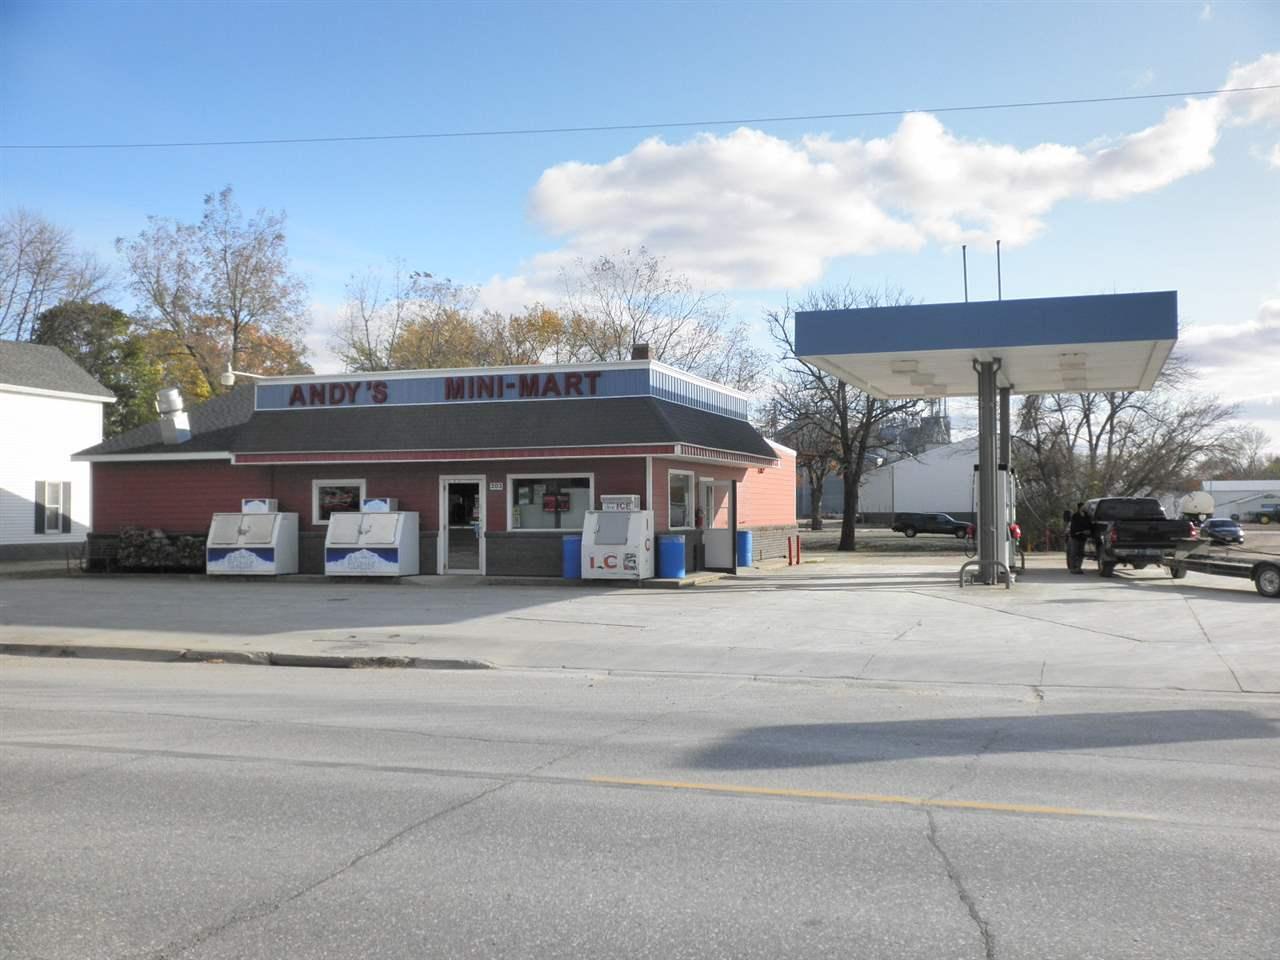 primary photo for 203 E Main, Riceville, IA 50466, US